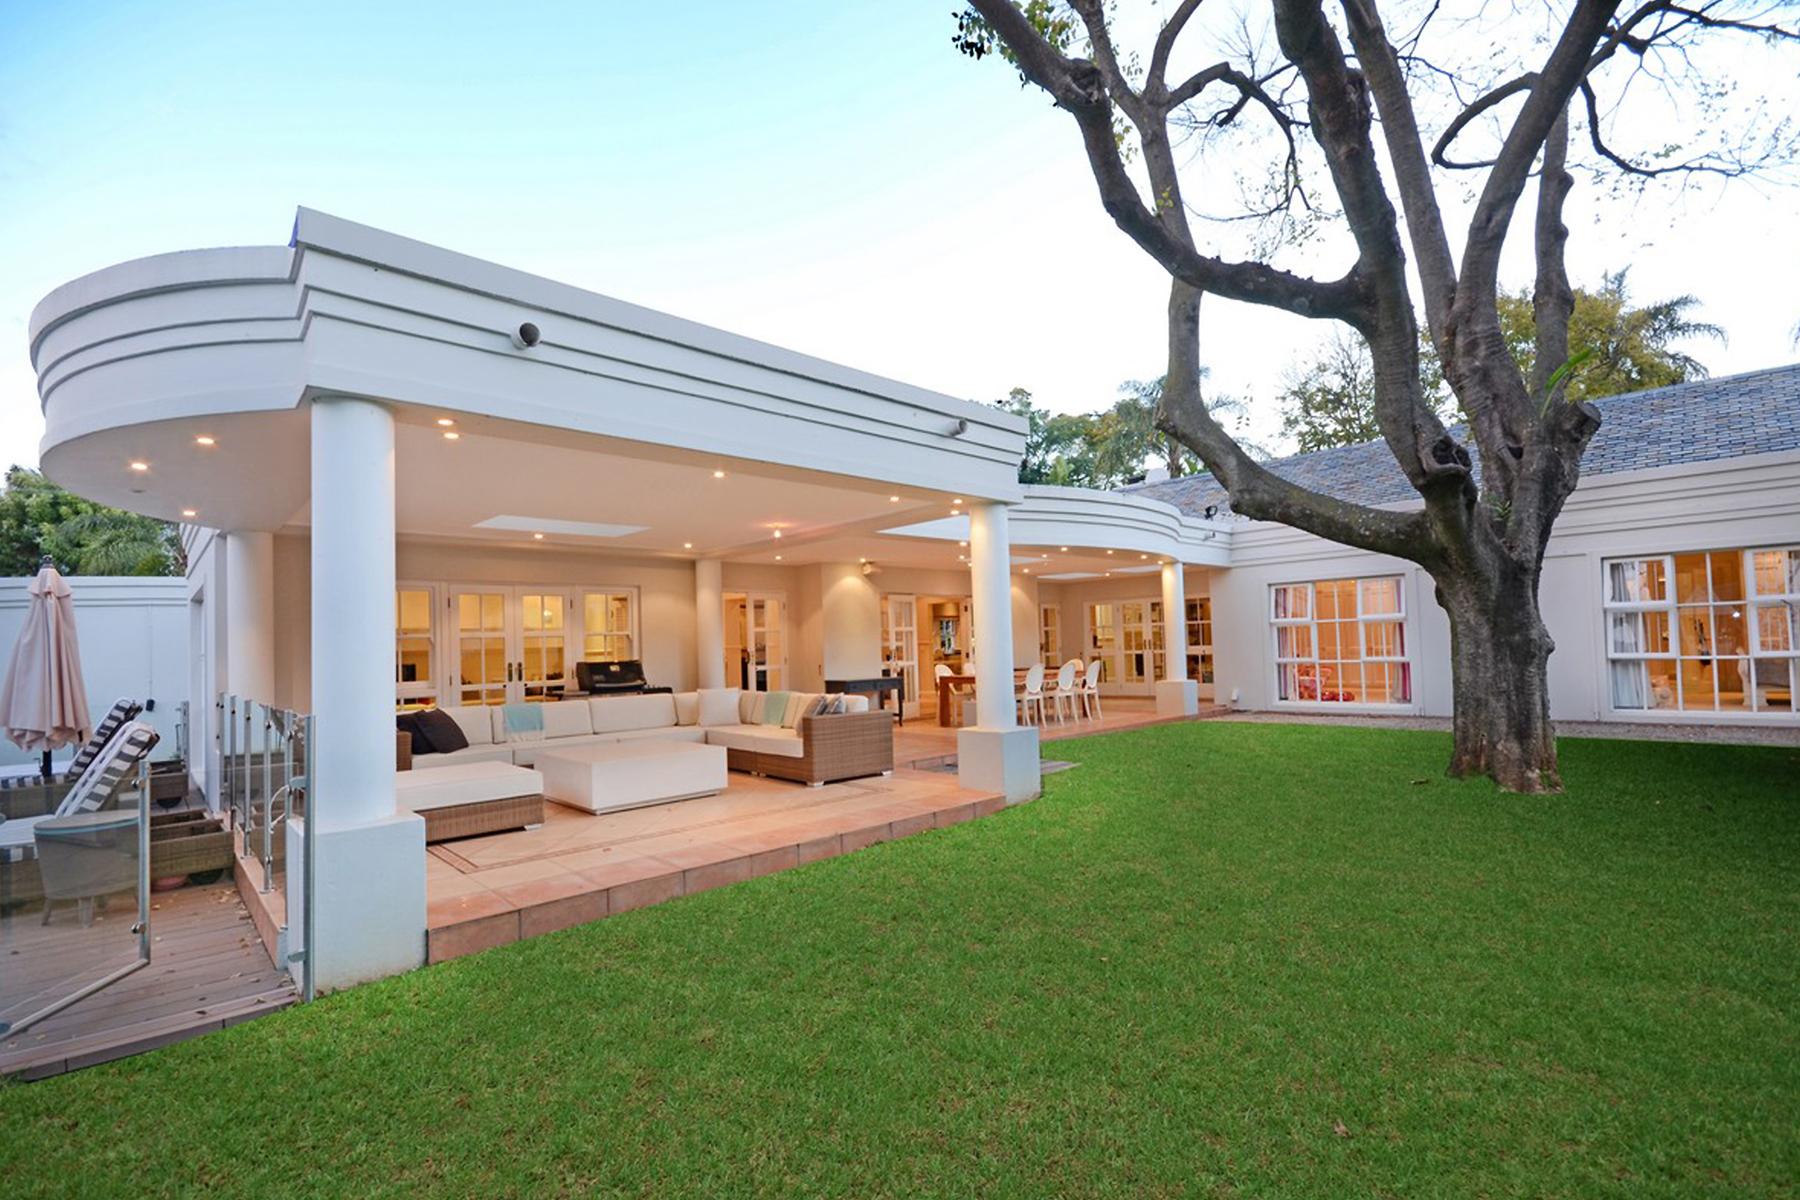 Casa Unifamiliar por un Venta en Atholl Atholl, Johannesburg, Provincia De Gauteng Sudáfrica